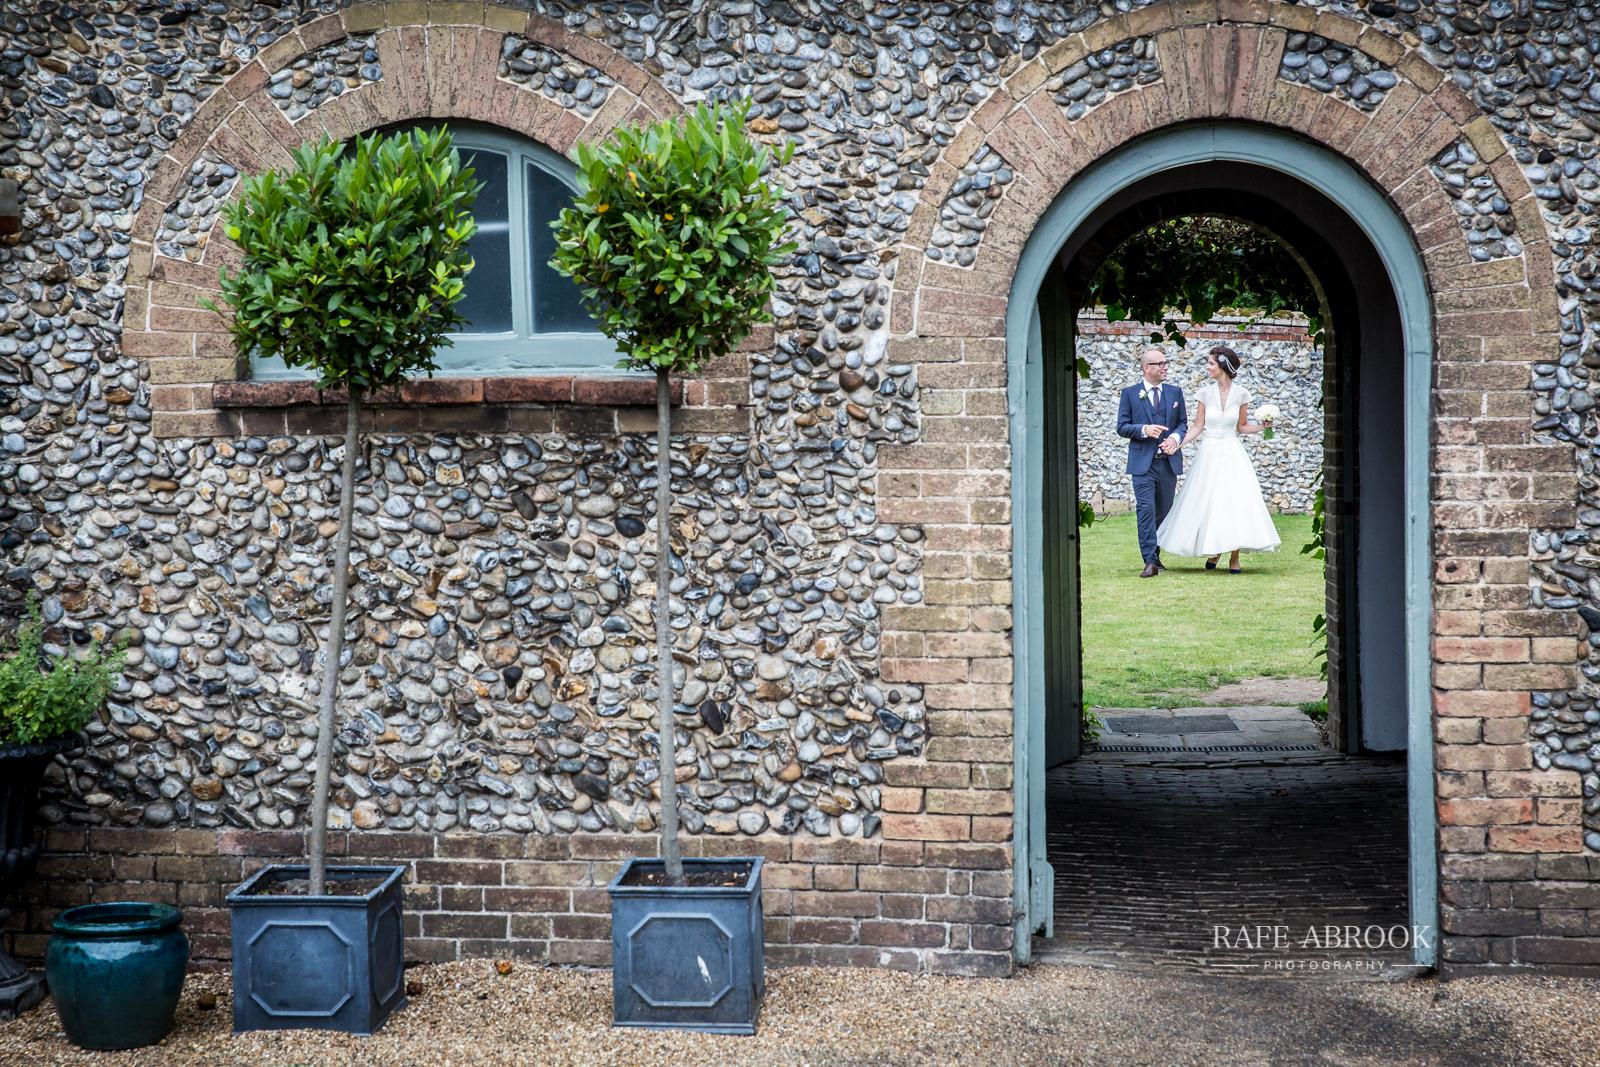 cley windmill wedding norfolk hertfordshire wedding photographer-1265.jpg